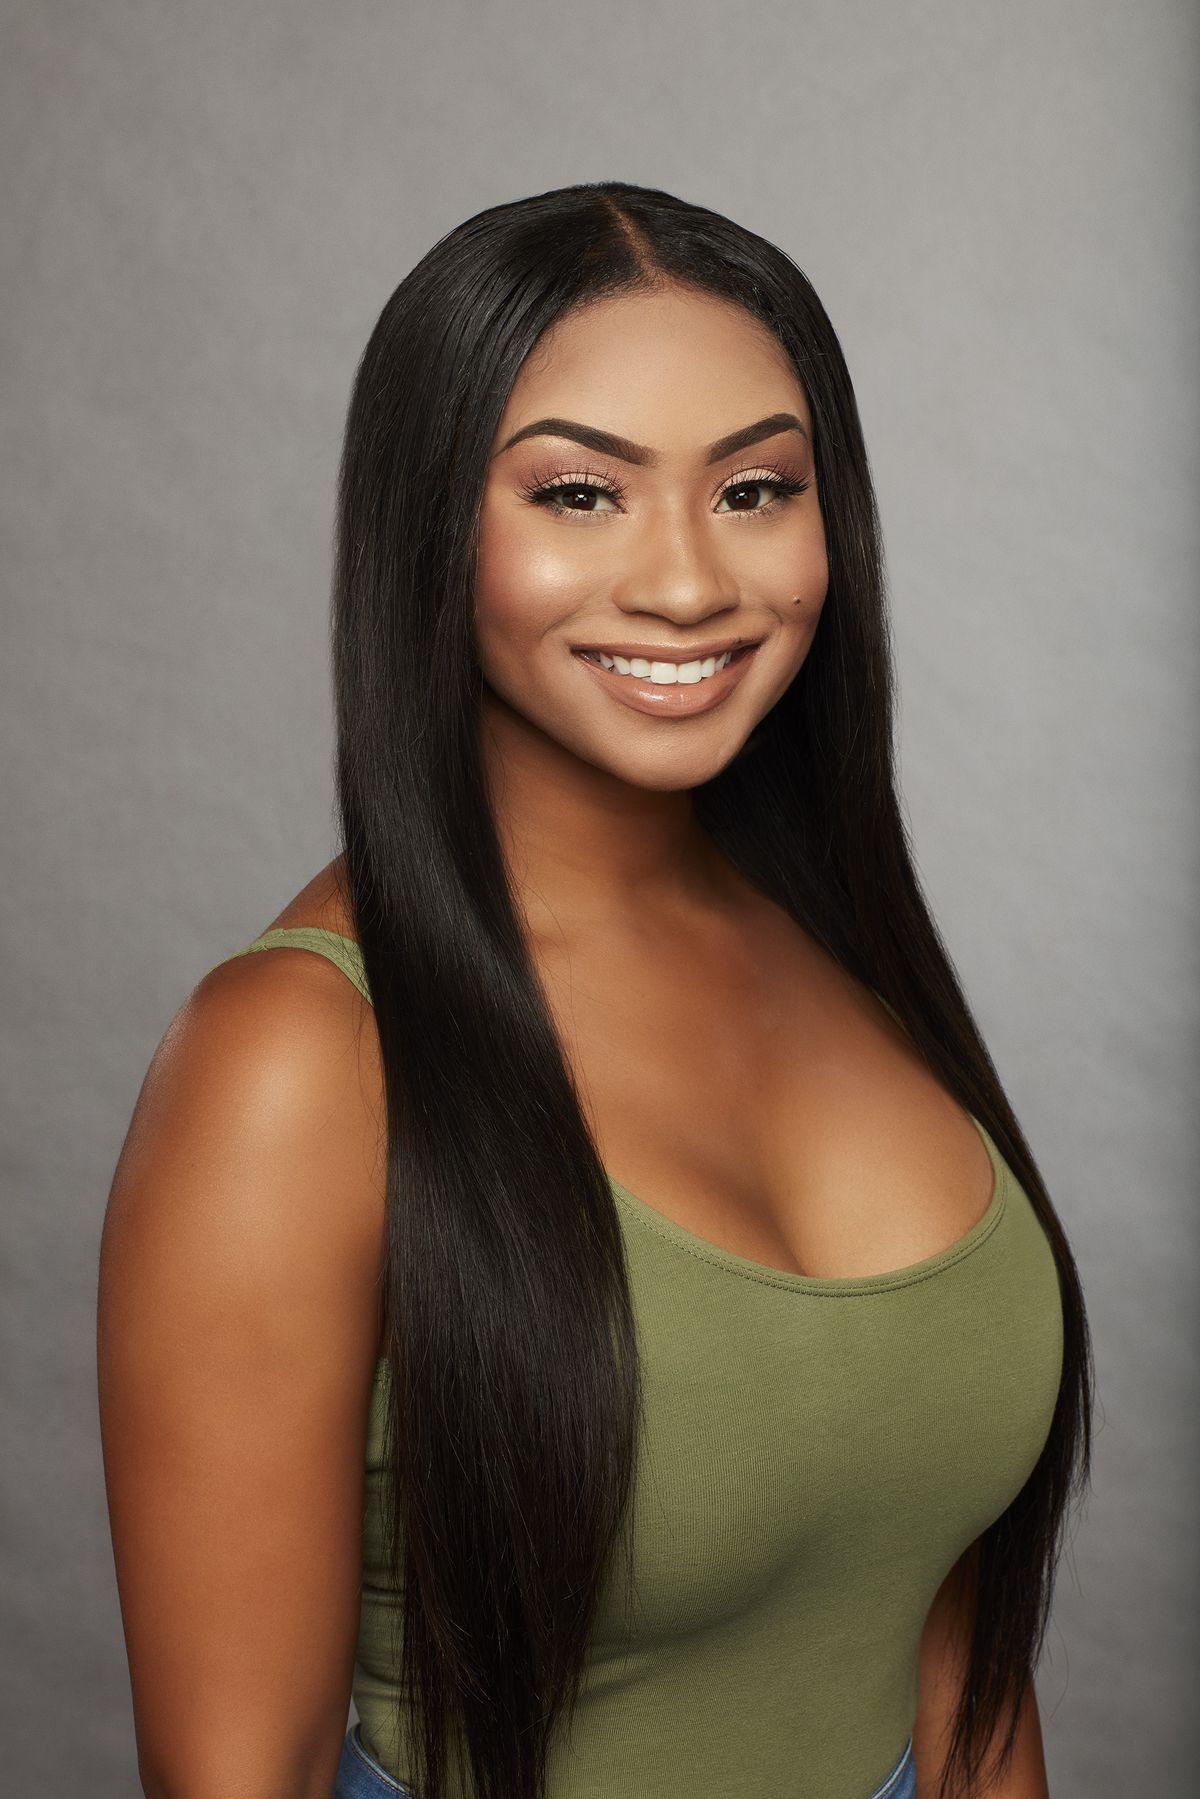 Bachelor contestant Brittane, 27